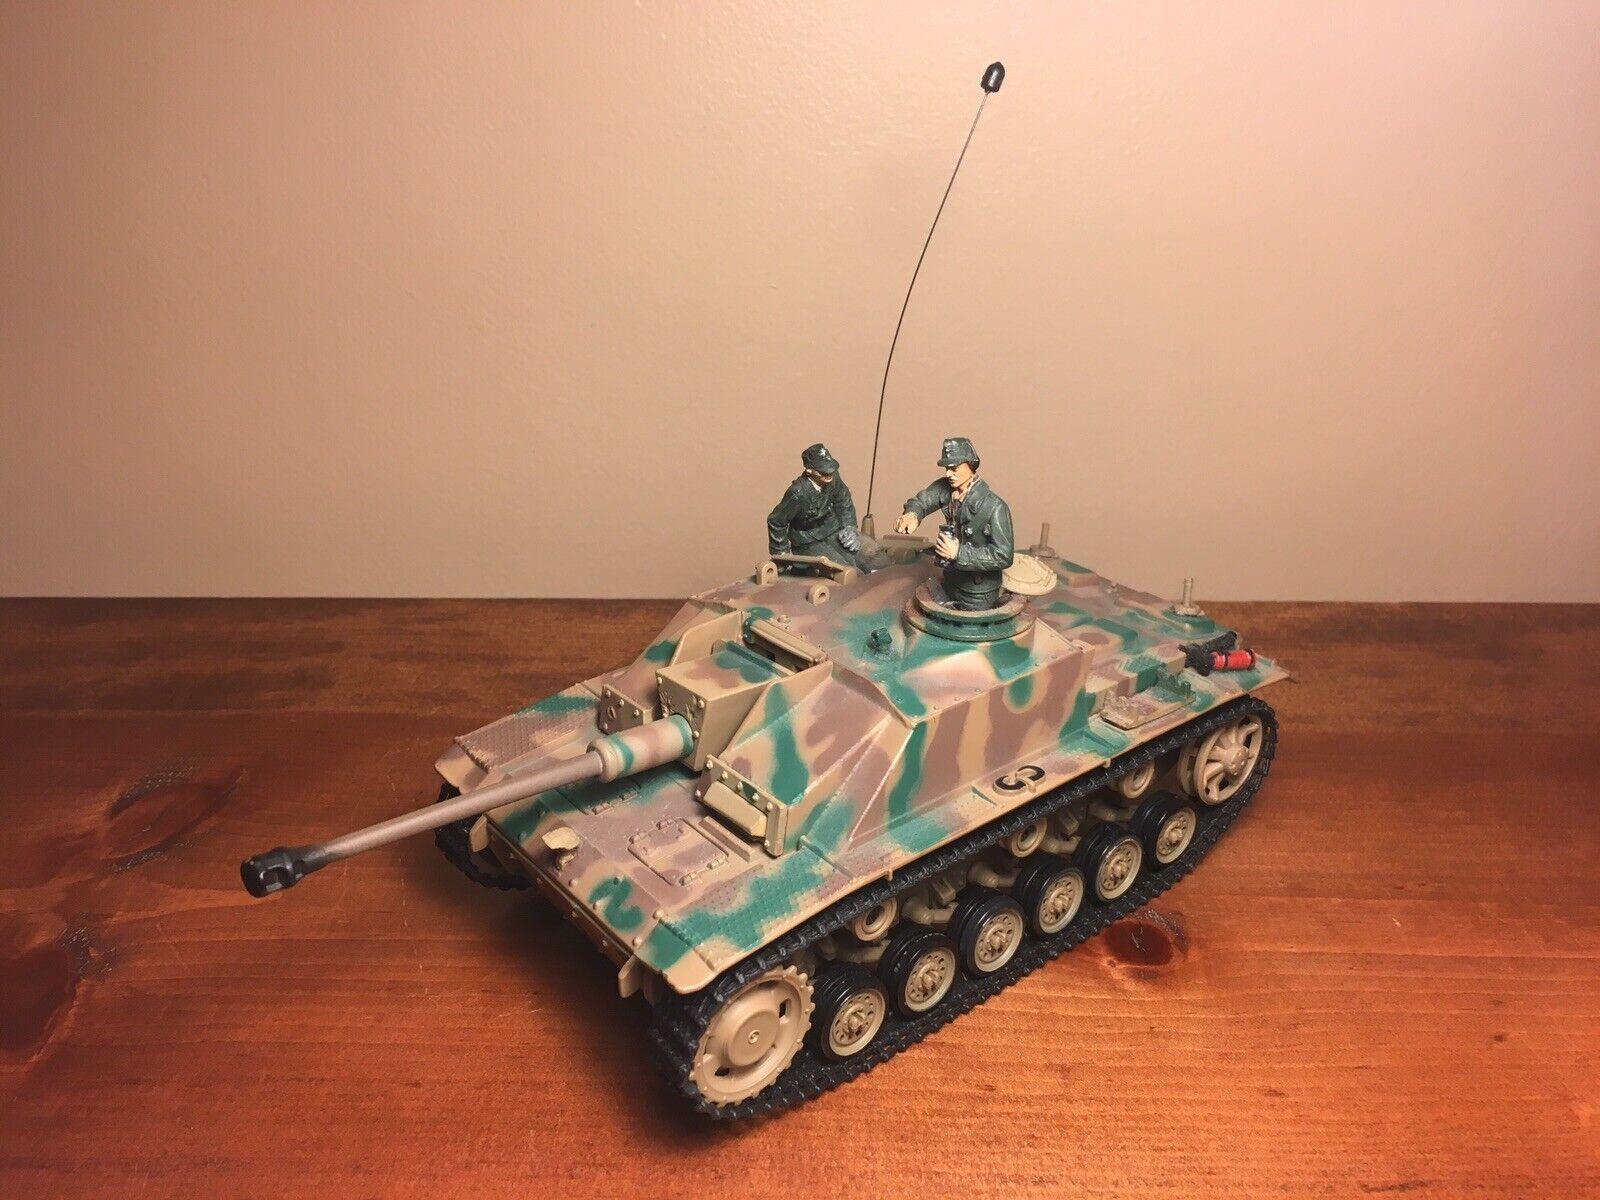 Forces Of Valor Unimax 1 32 German StuG III Tank Eastern Front, 1944